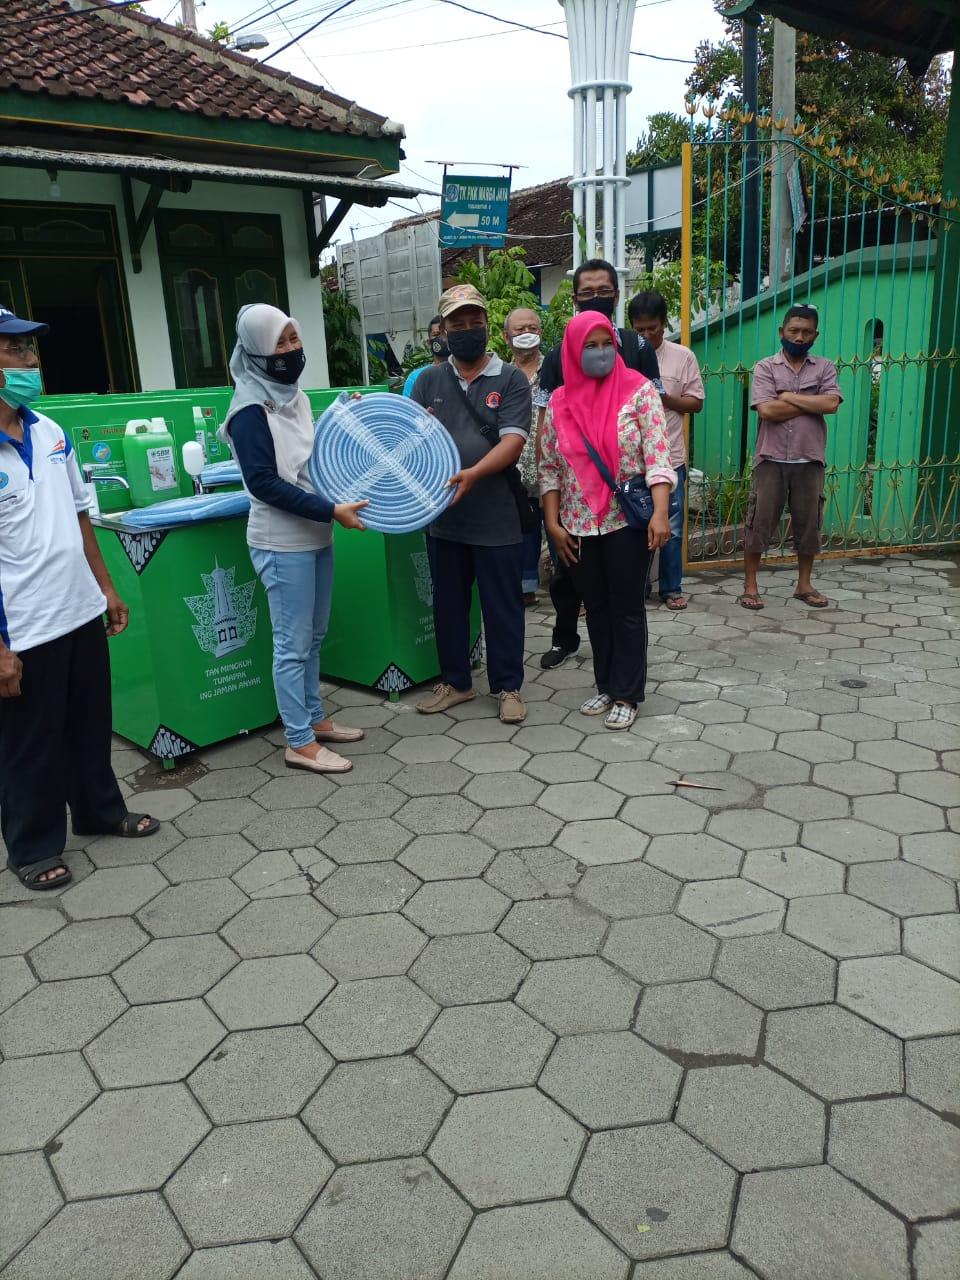 Penyerahan Wastafel Portabel Dari BPBD Kota  Yogyakarta Untuk  14 RW Se Kelurahan Purbayan